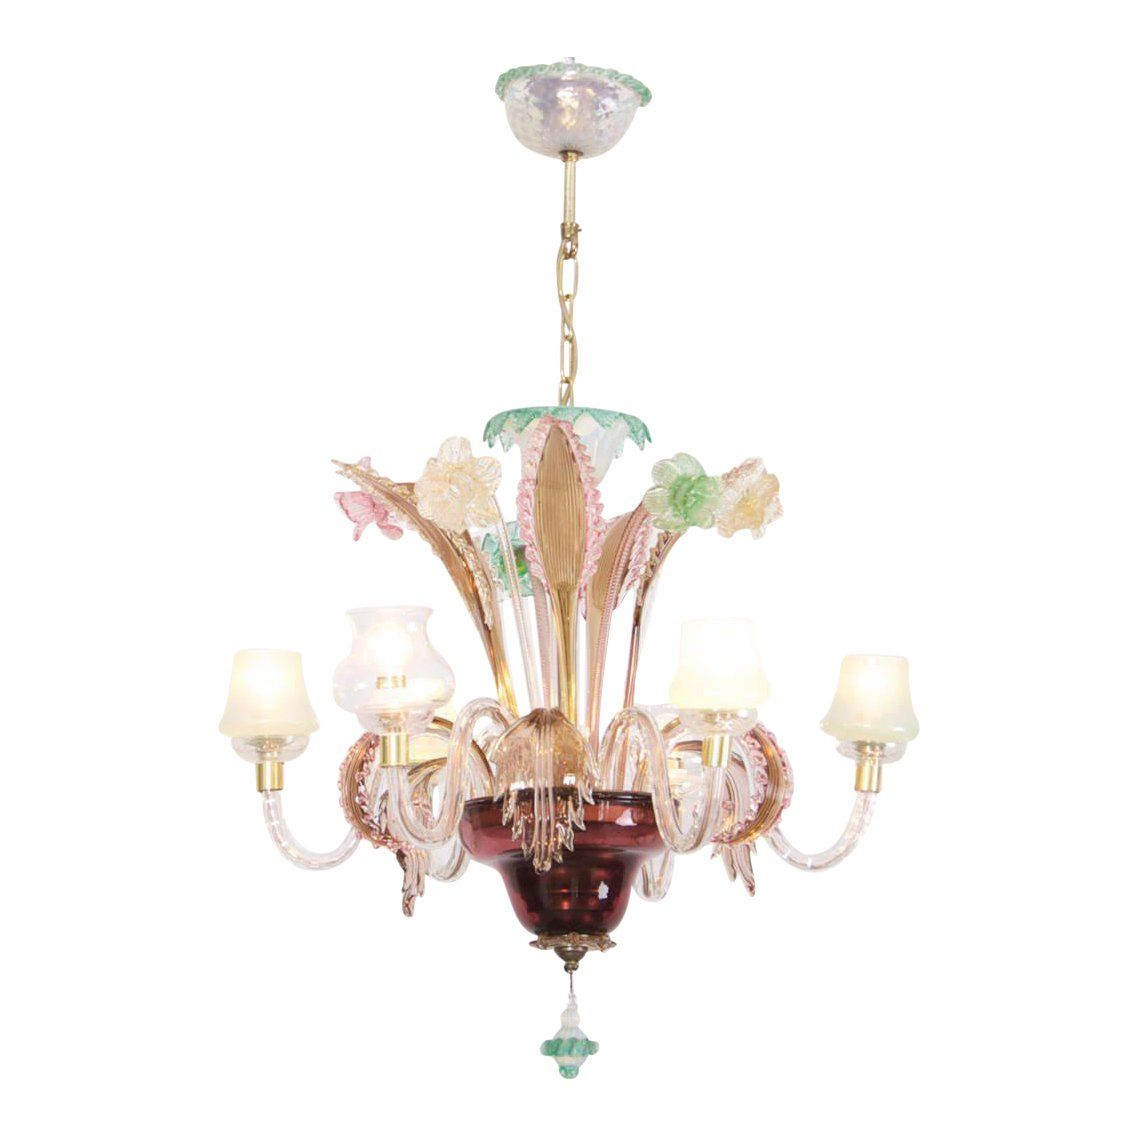 Multicolored Venetian Murano Glass Chandelier Image